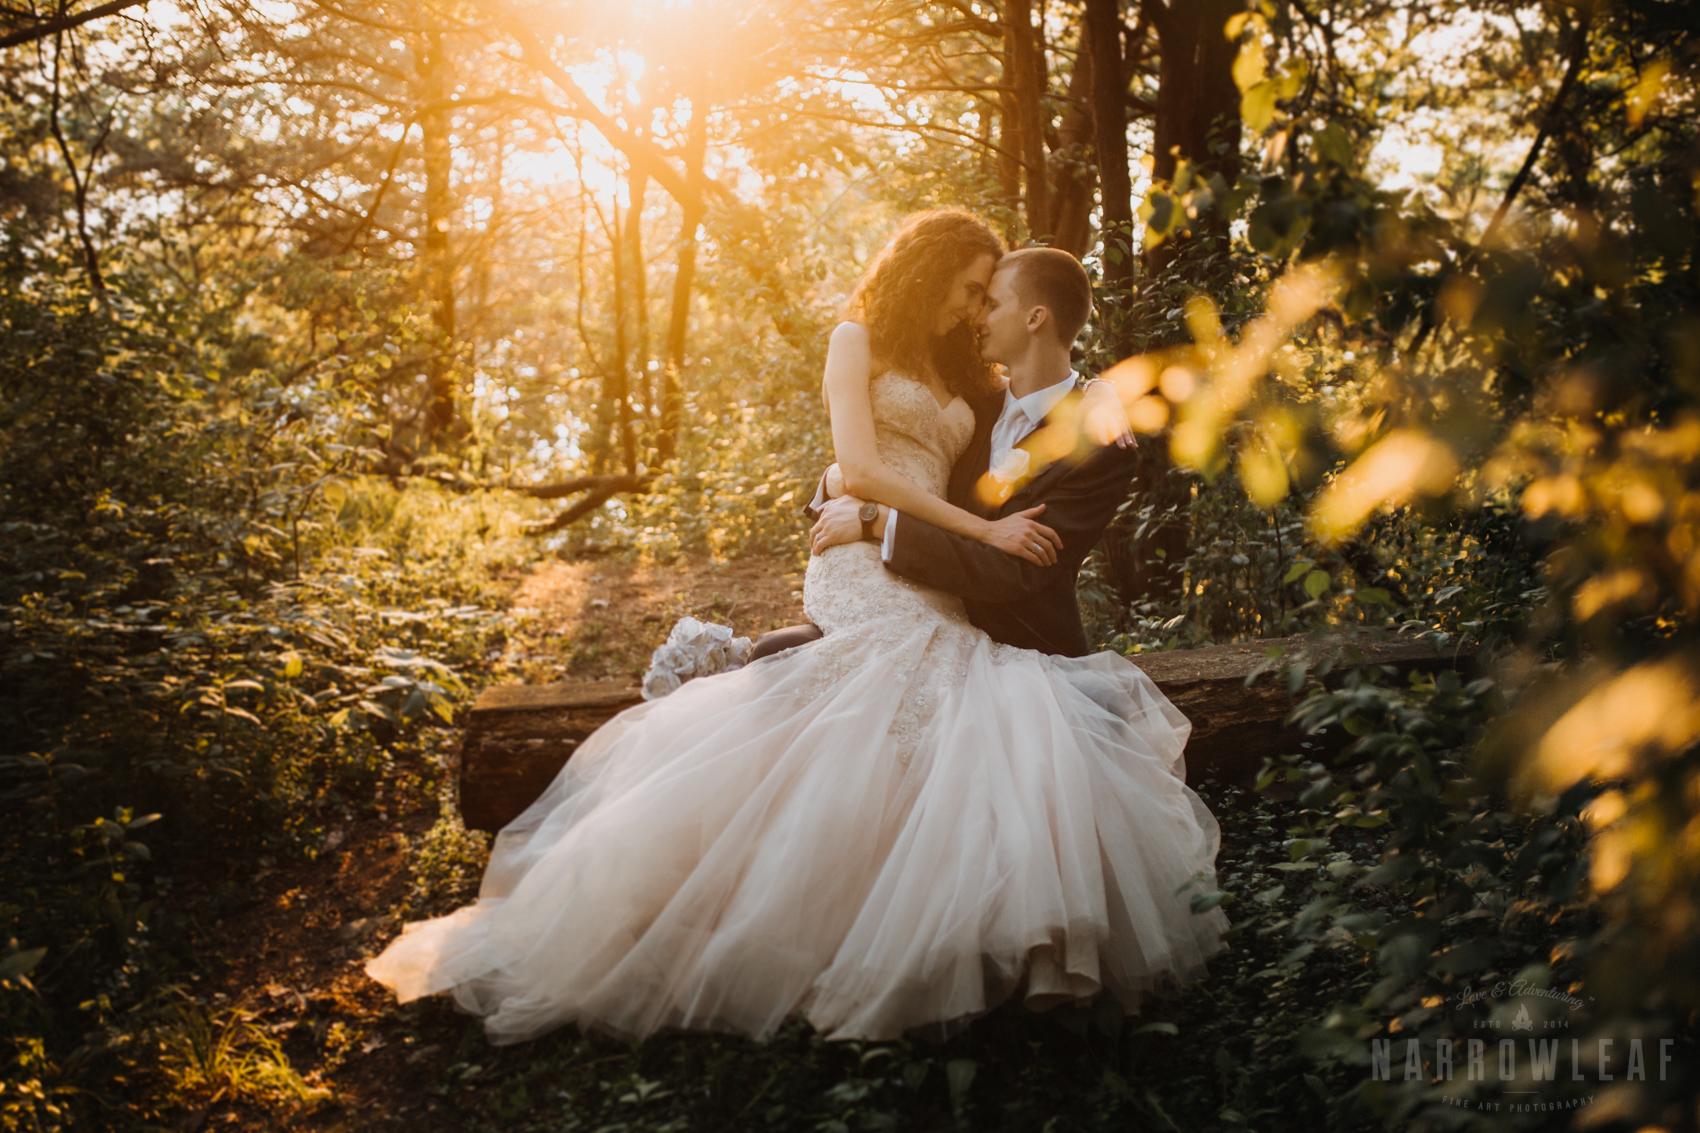 bride-mermaid-lace-wedding-gown-glitter-woods-sunset-303.jpg